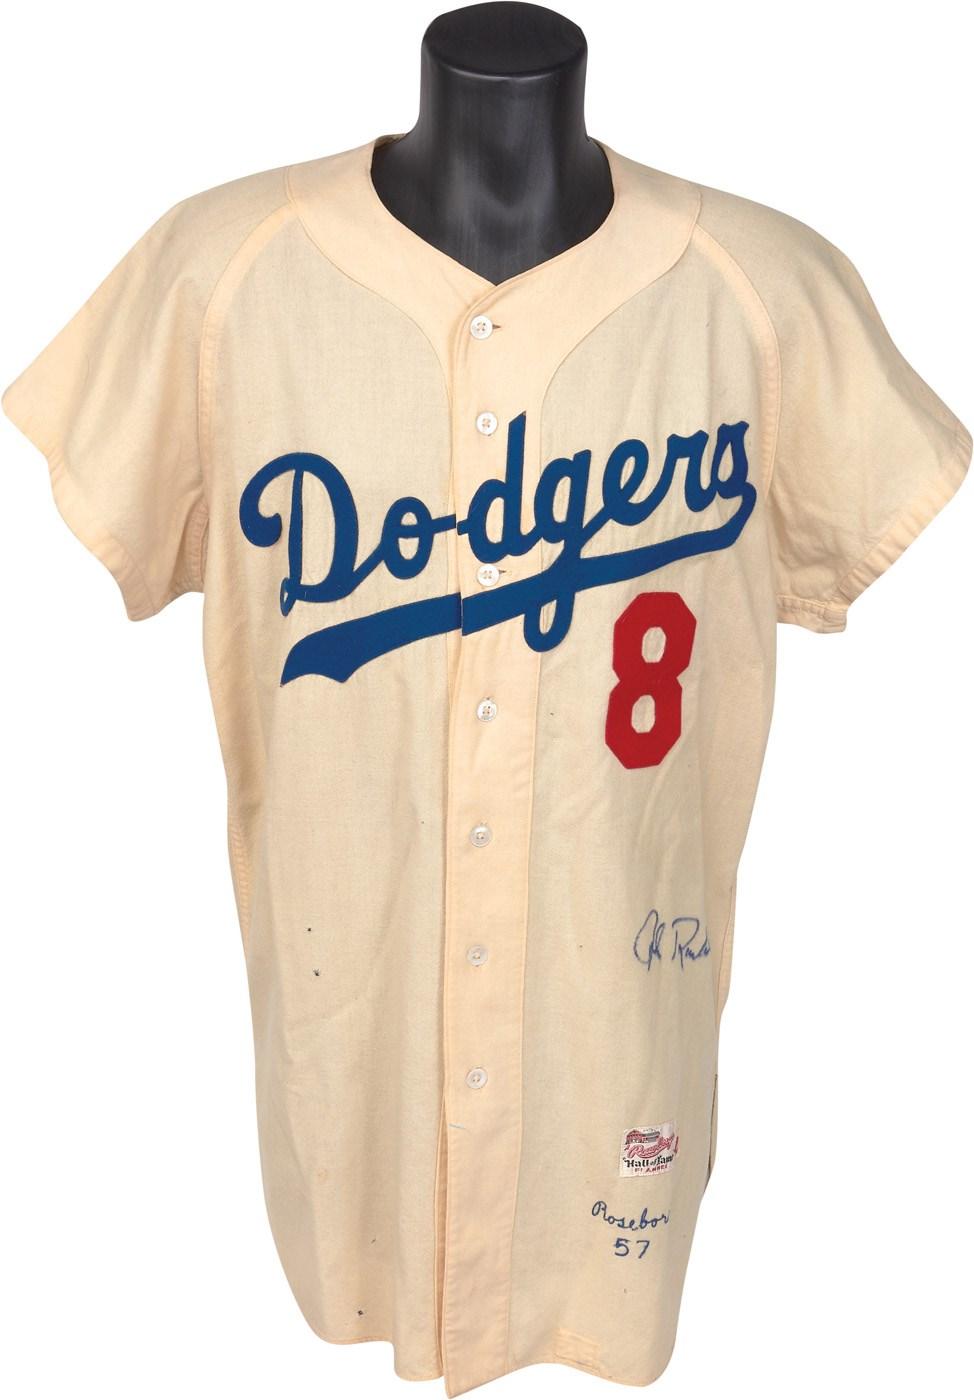 the best attitude 15538 4e4ba 1957 John Roseboro Brooklyn Dodgers Game Worn Jersey - Last ...